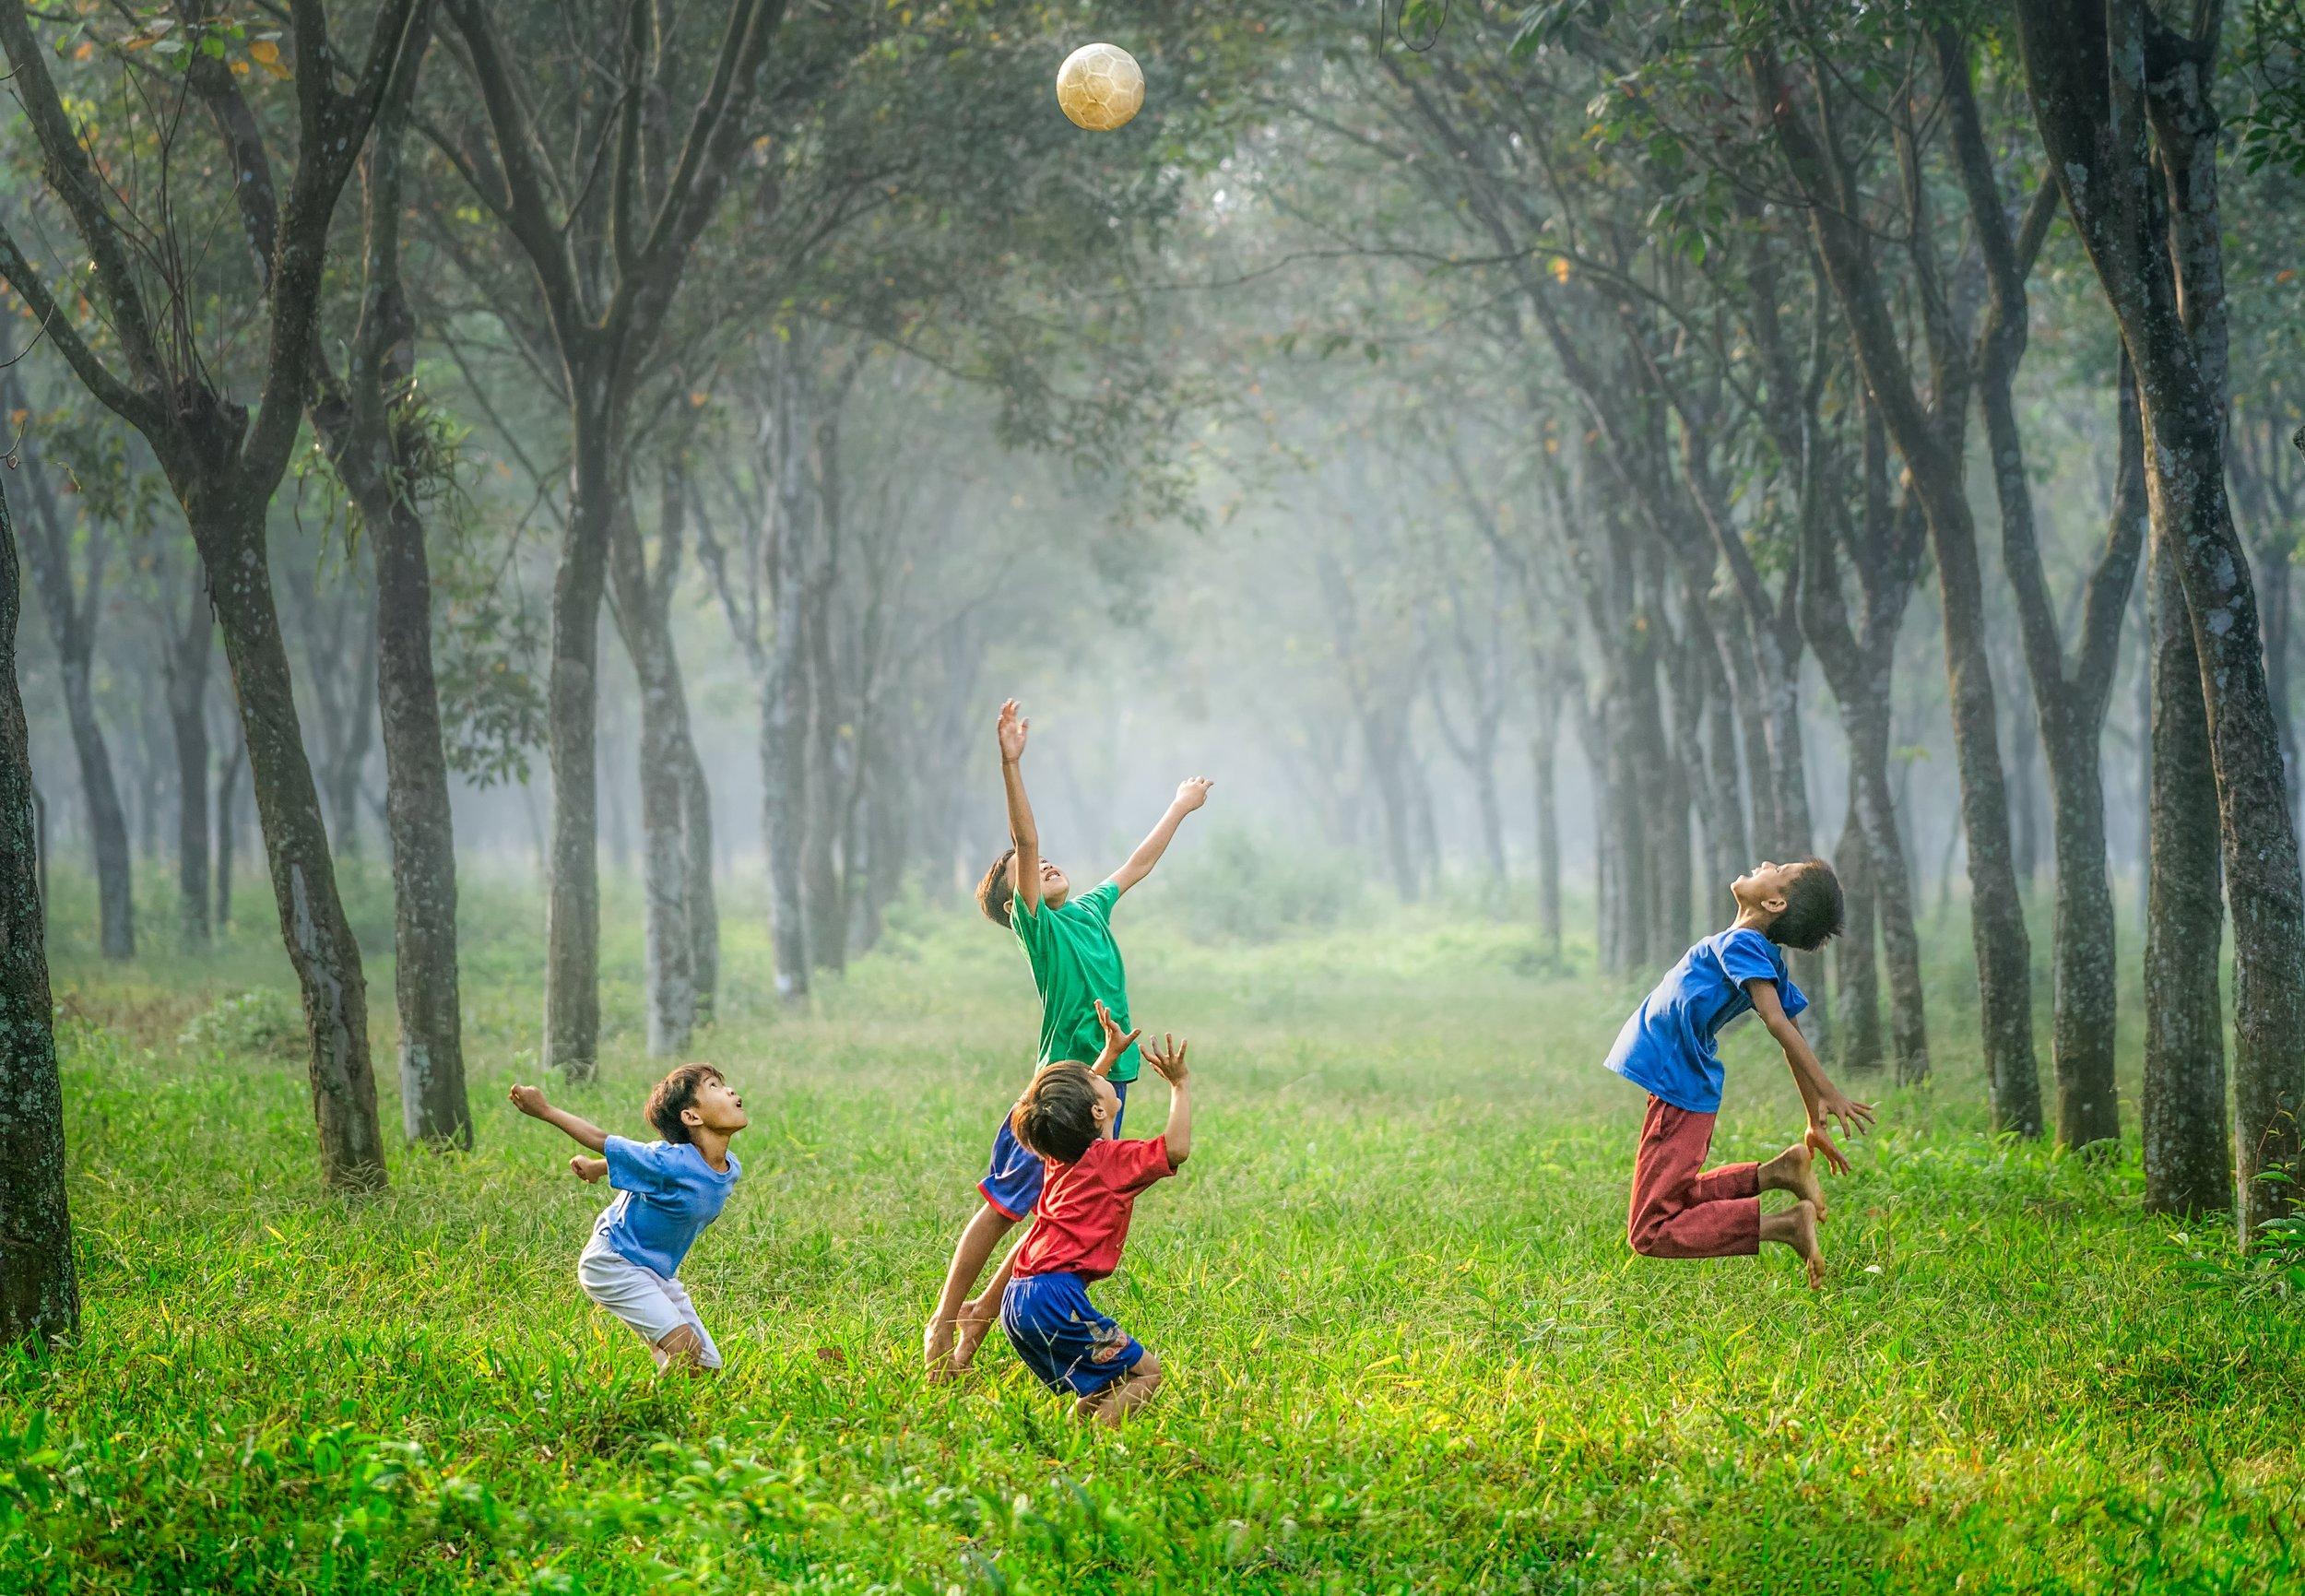 Boys Playing Ball Outside.jpg